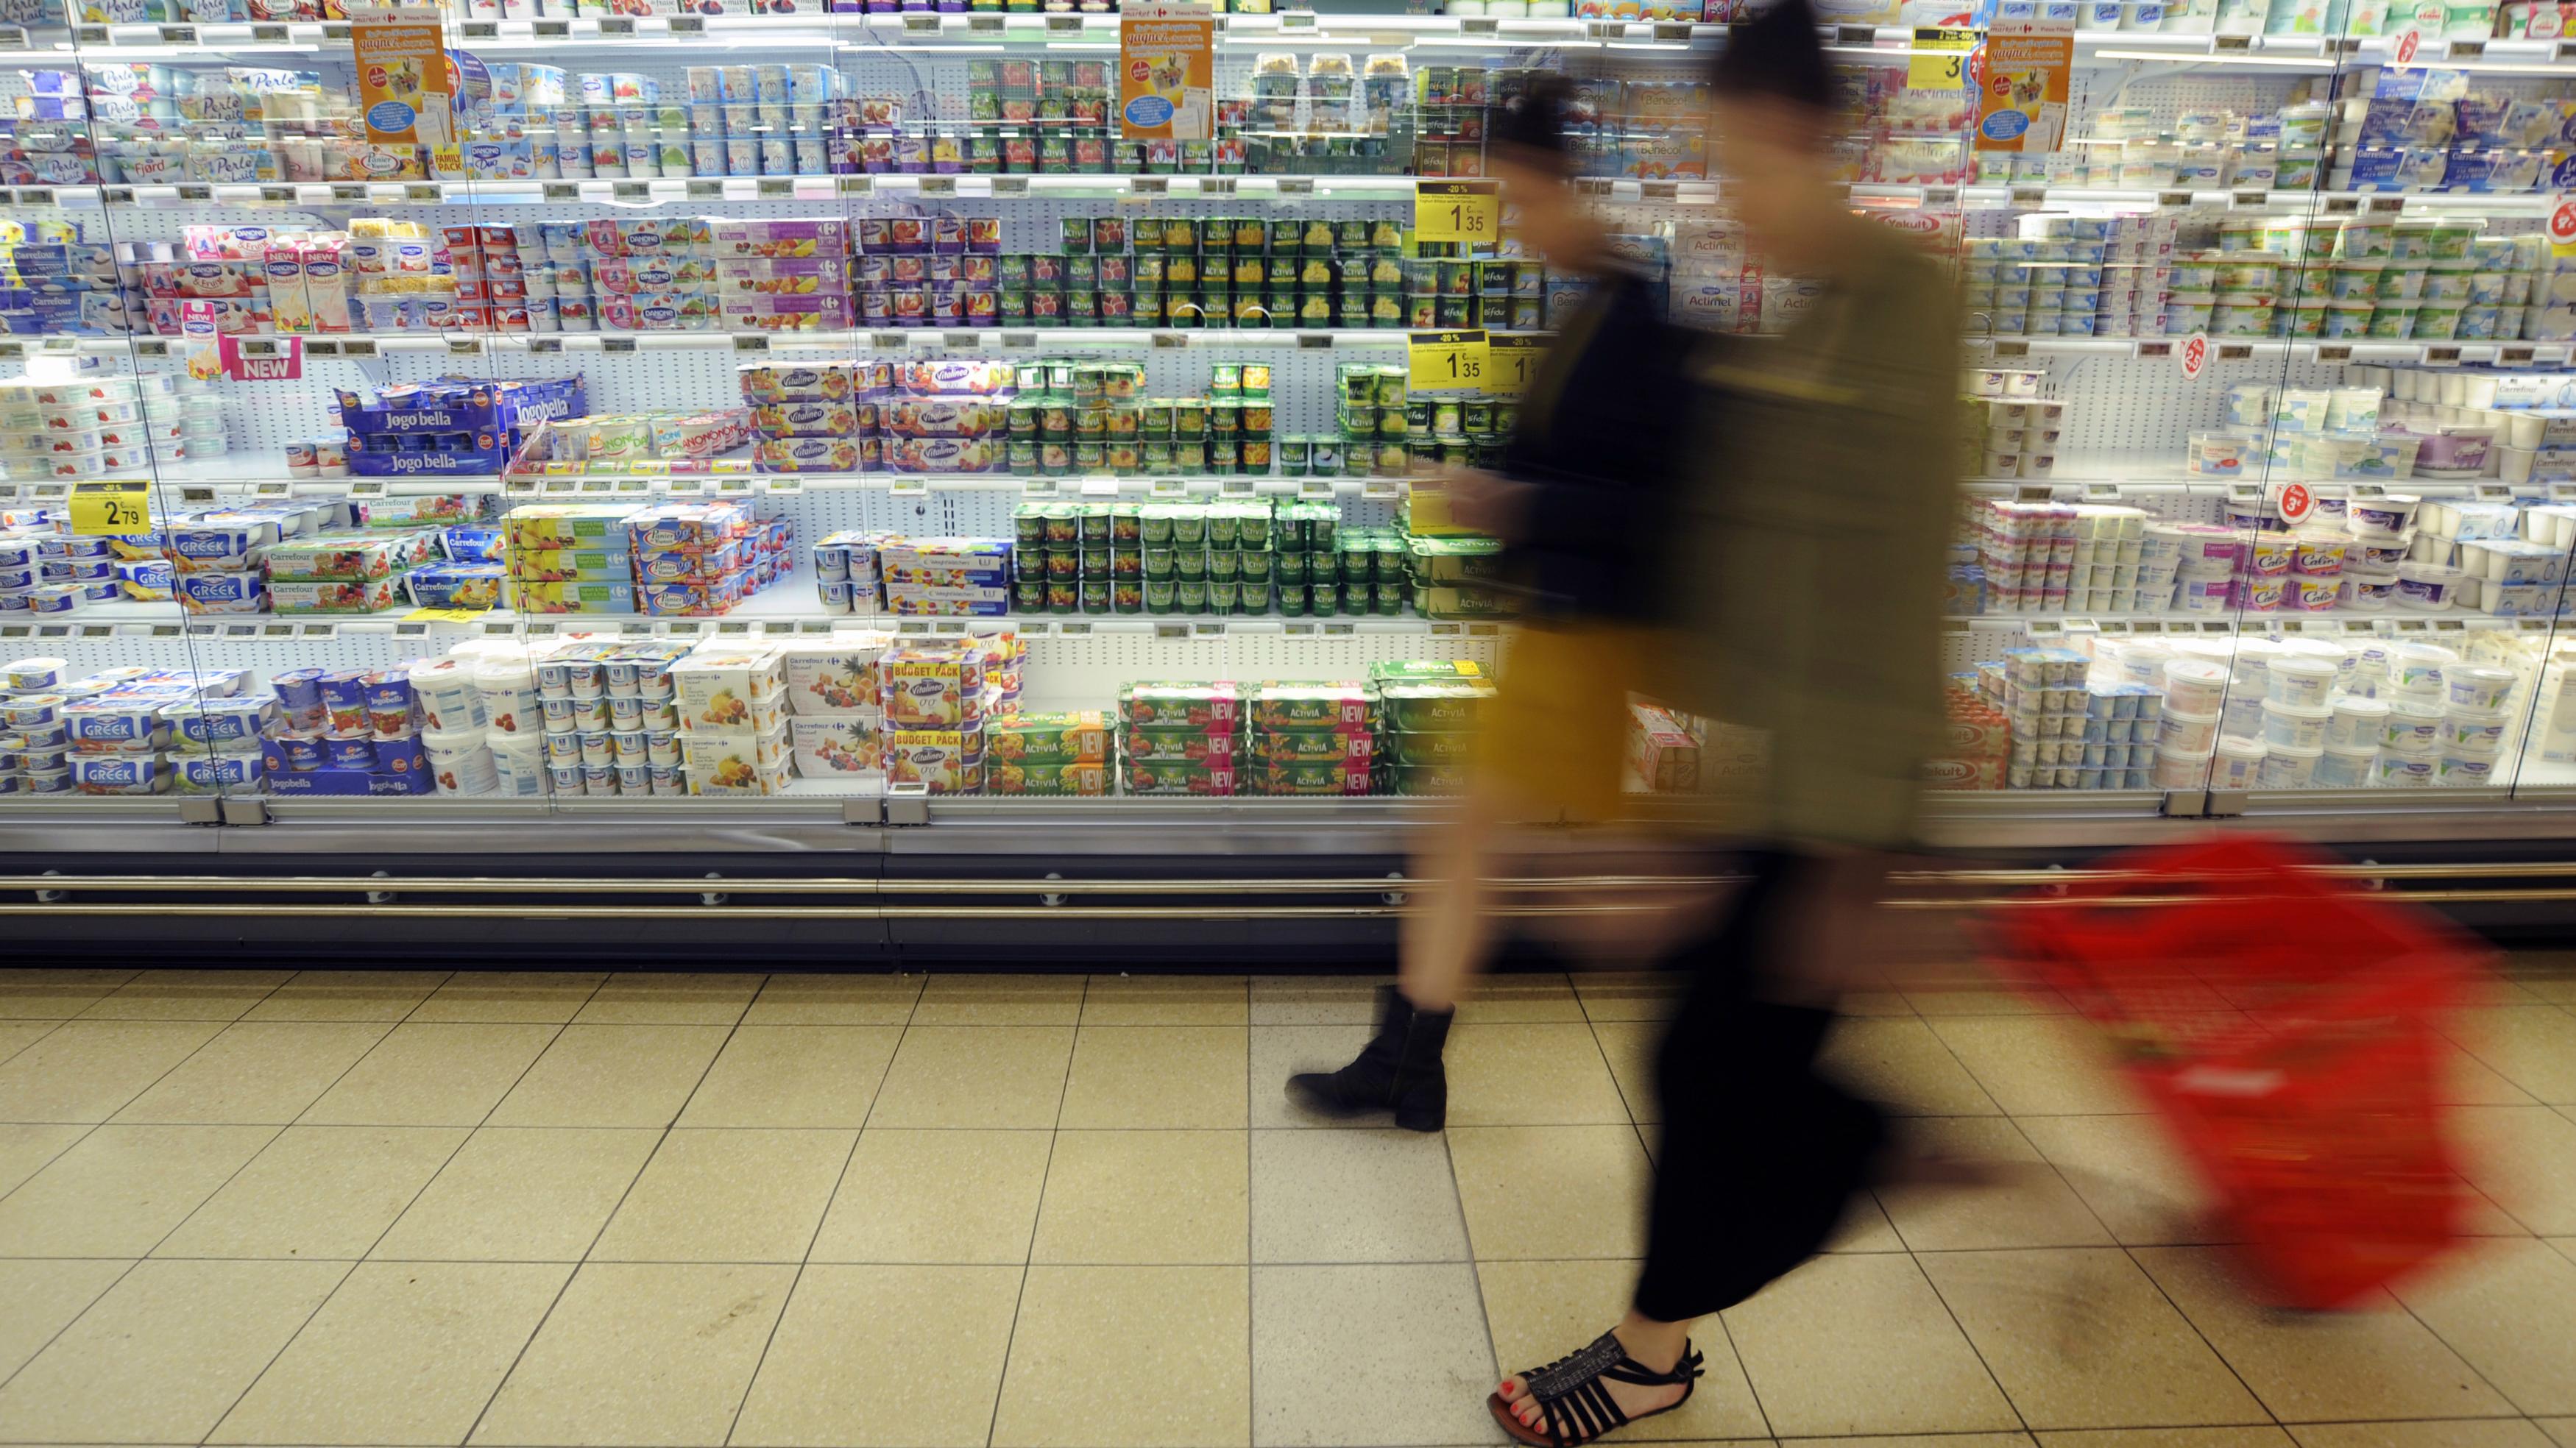 generic-brands-revamp-challenge-Whole-Foods-business — Quartz